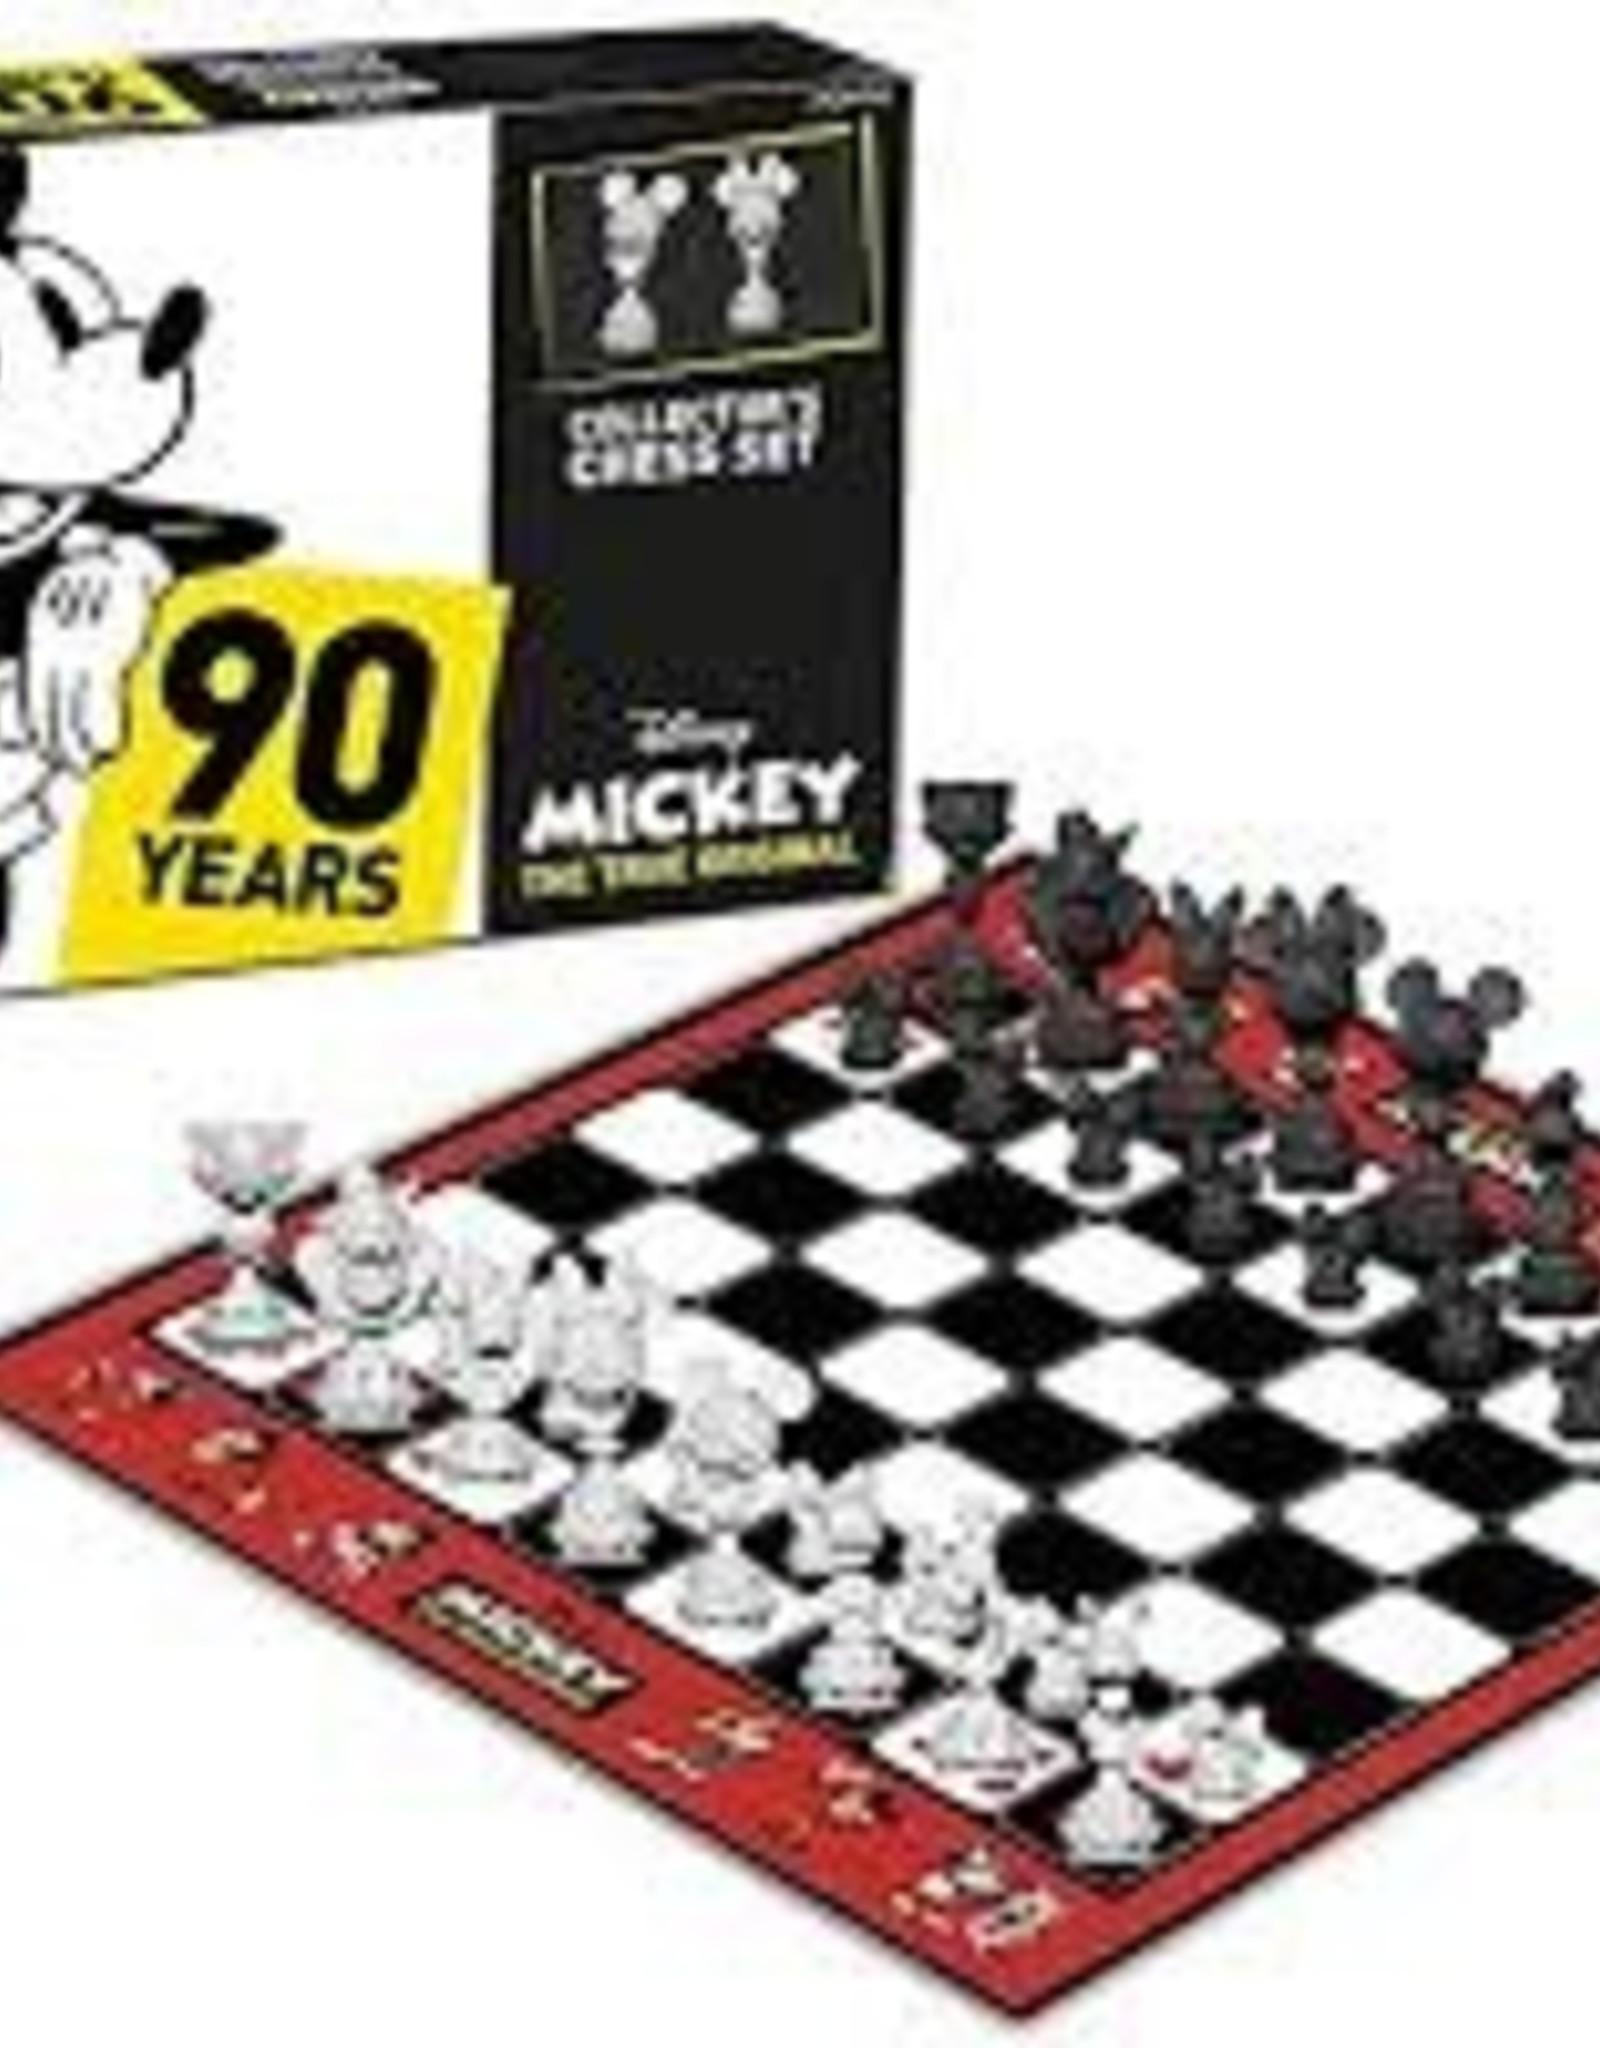 USAopoly Chess - Mickey the True Original